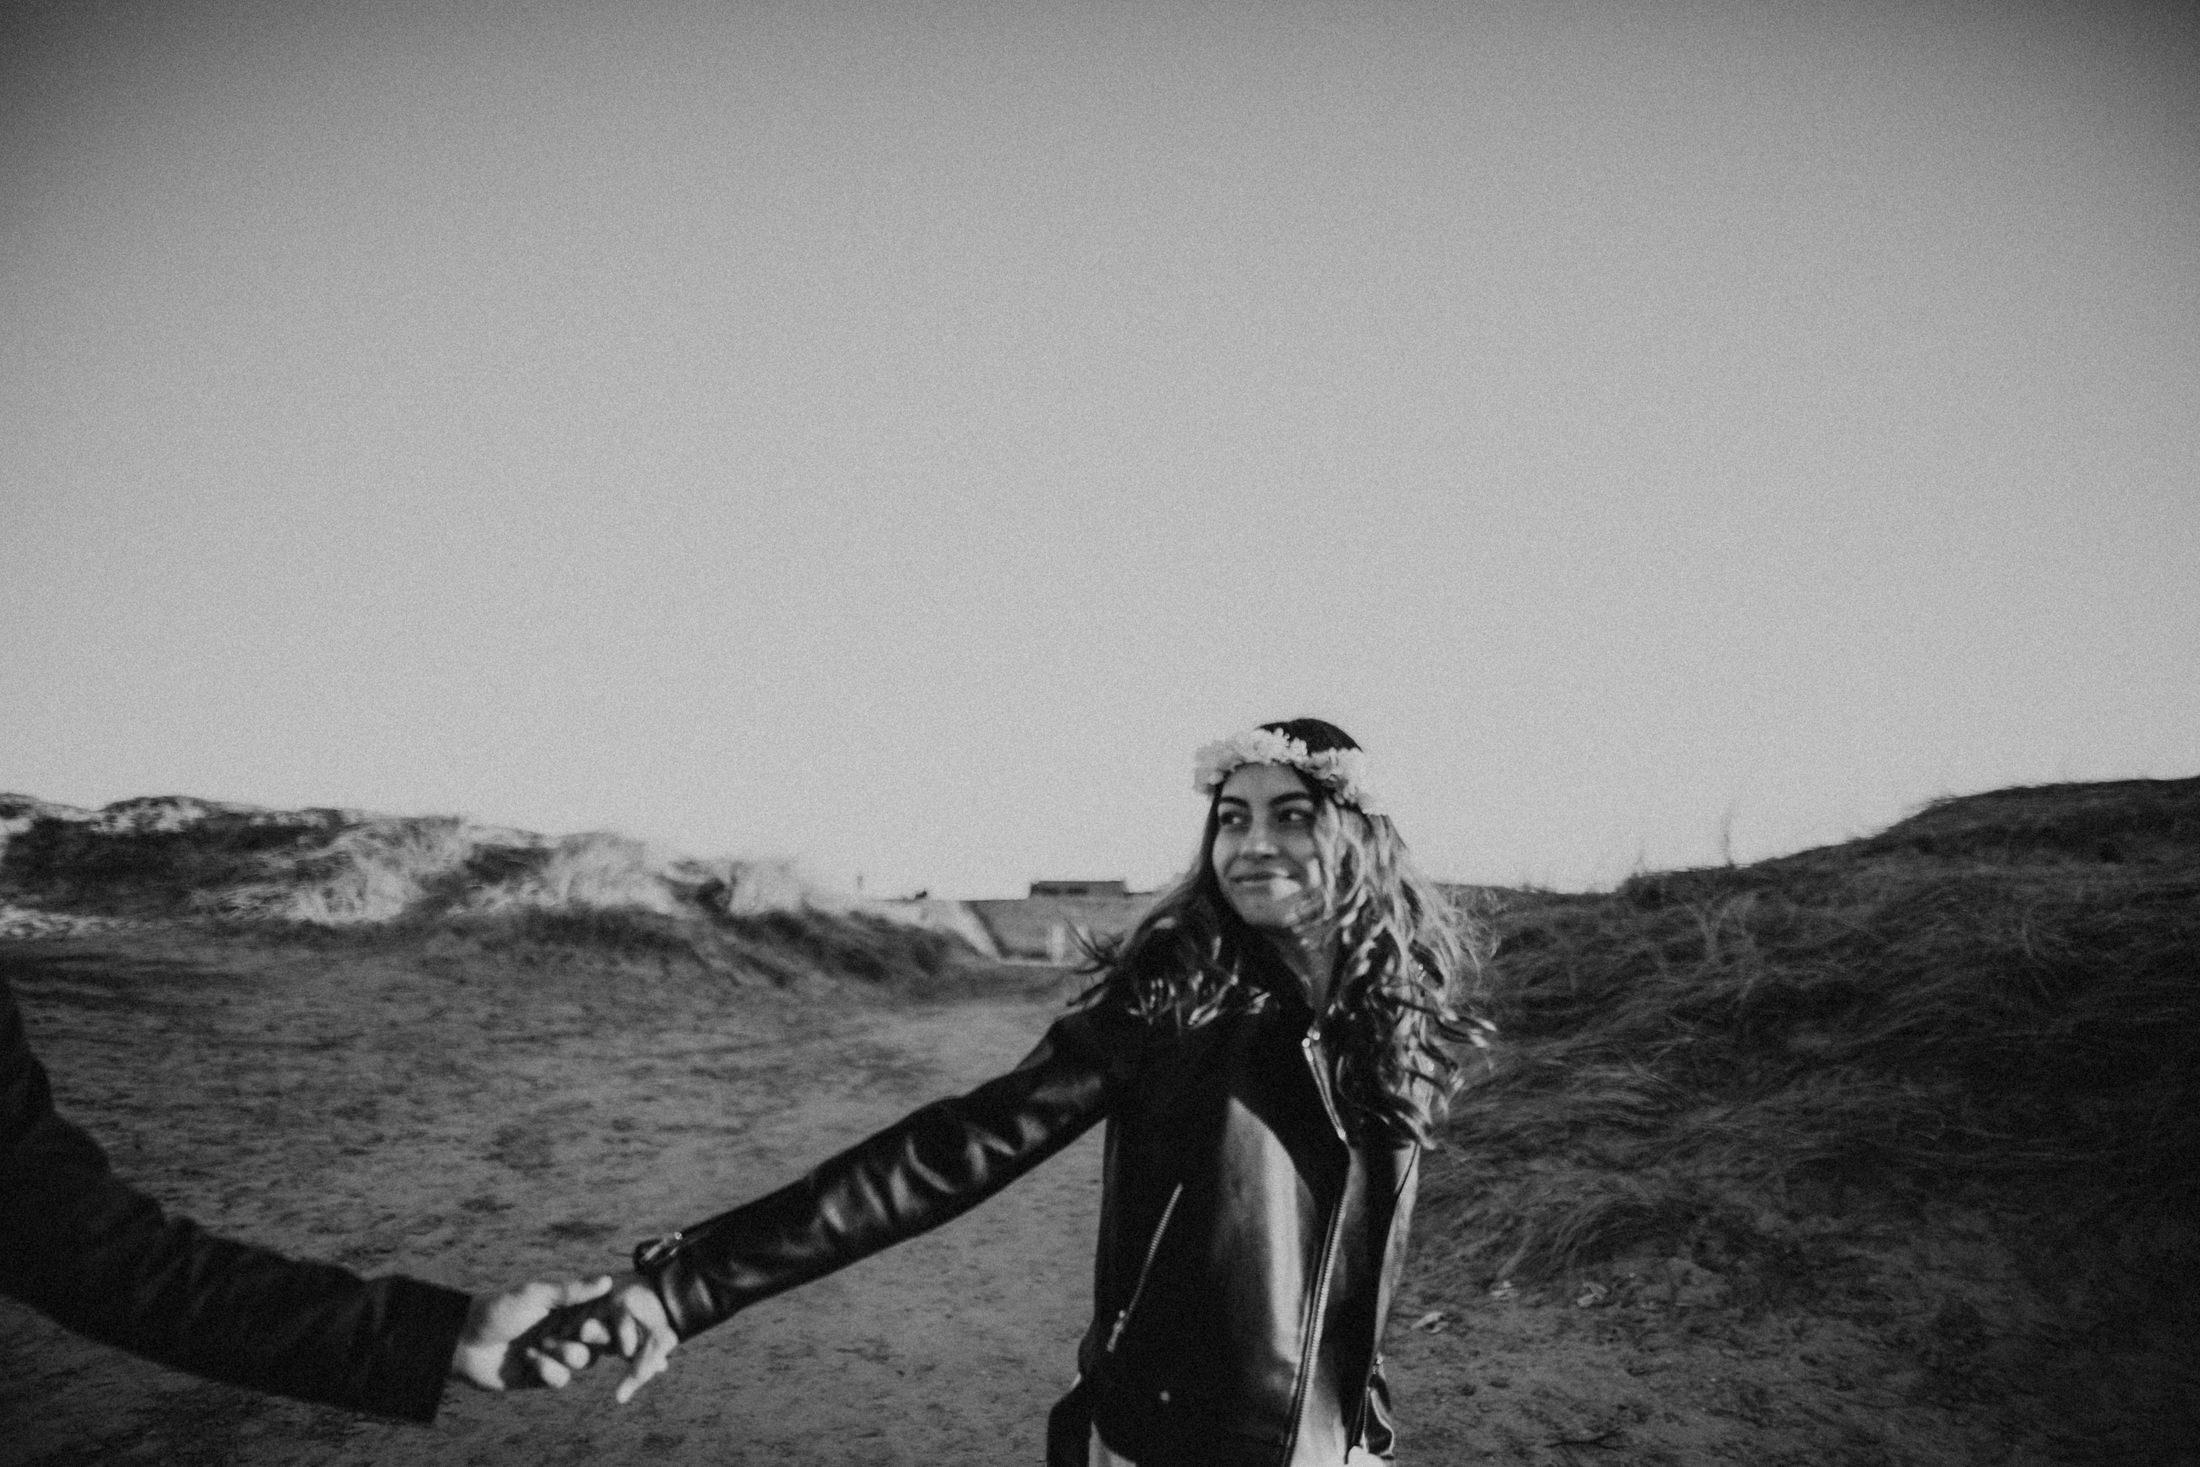 Wedding_Photographer_Mallorca_Daniela-Marquardt_Photography_CanaryIslands_Lanzarote_Iceland_Tuskany_Santorini_Portugal_Schweiz_Austria_Bayern_Elopement_Hochzeitsfotograf_Norddeichich_15